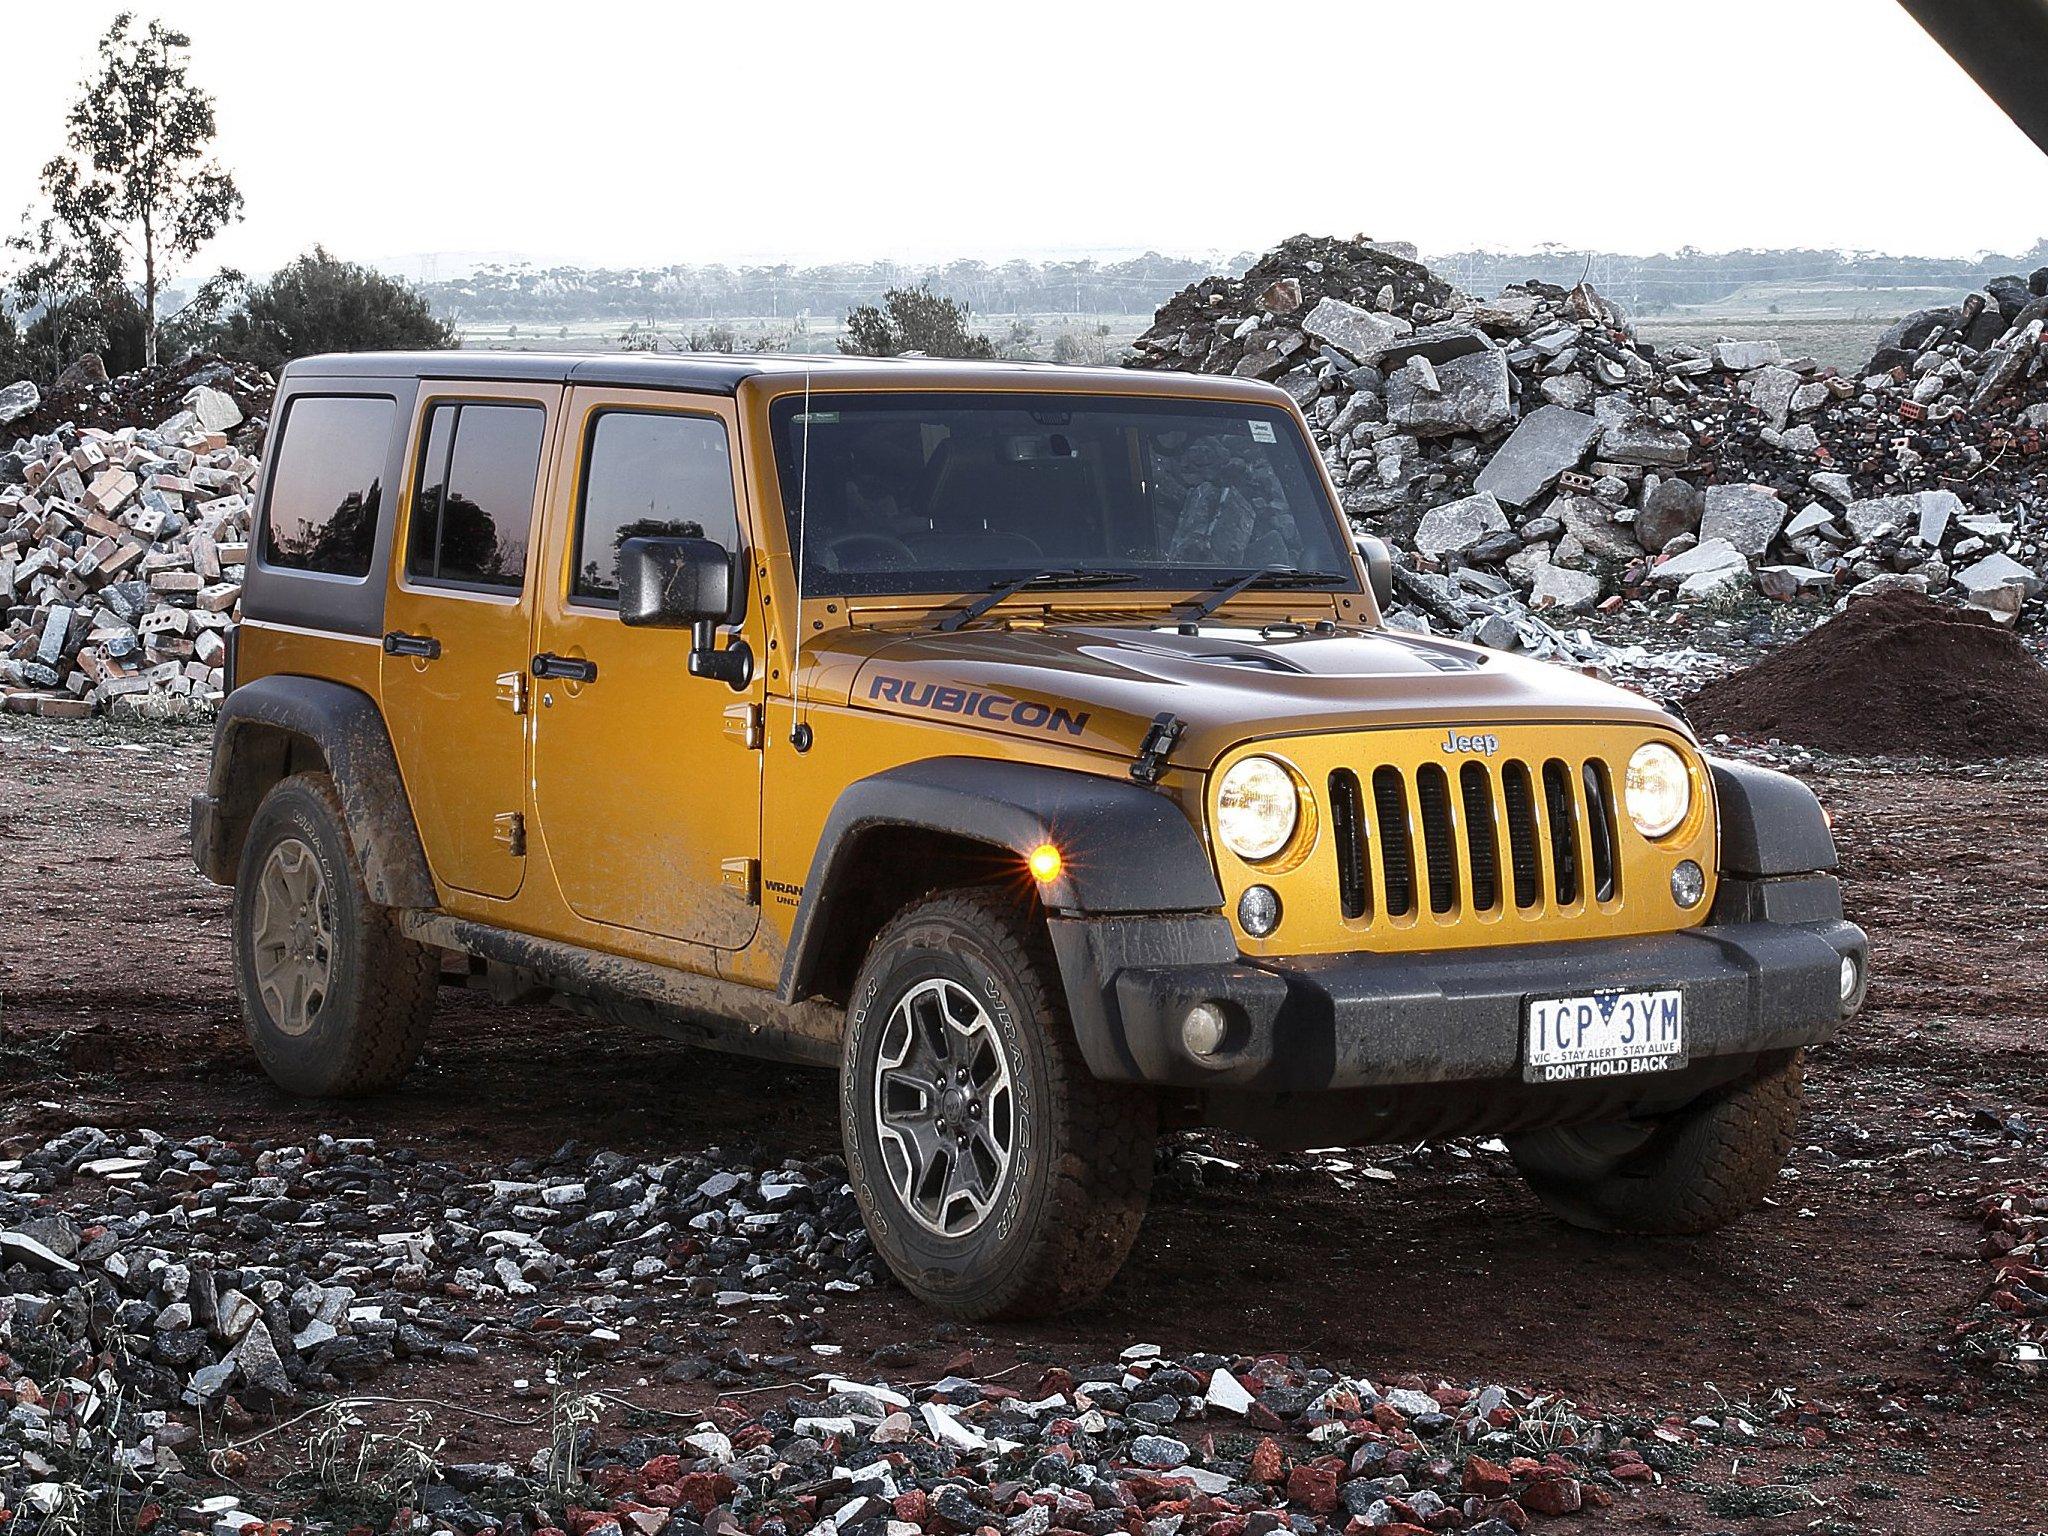 2015 Jeep Wrangler Unlimited Rubicon X Au Spec J K 4x4 Suv Pick Up Specs Wallpaper 2048x1536 449806 Wallpaperup